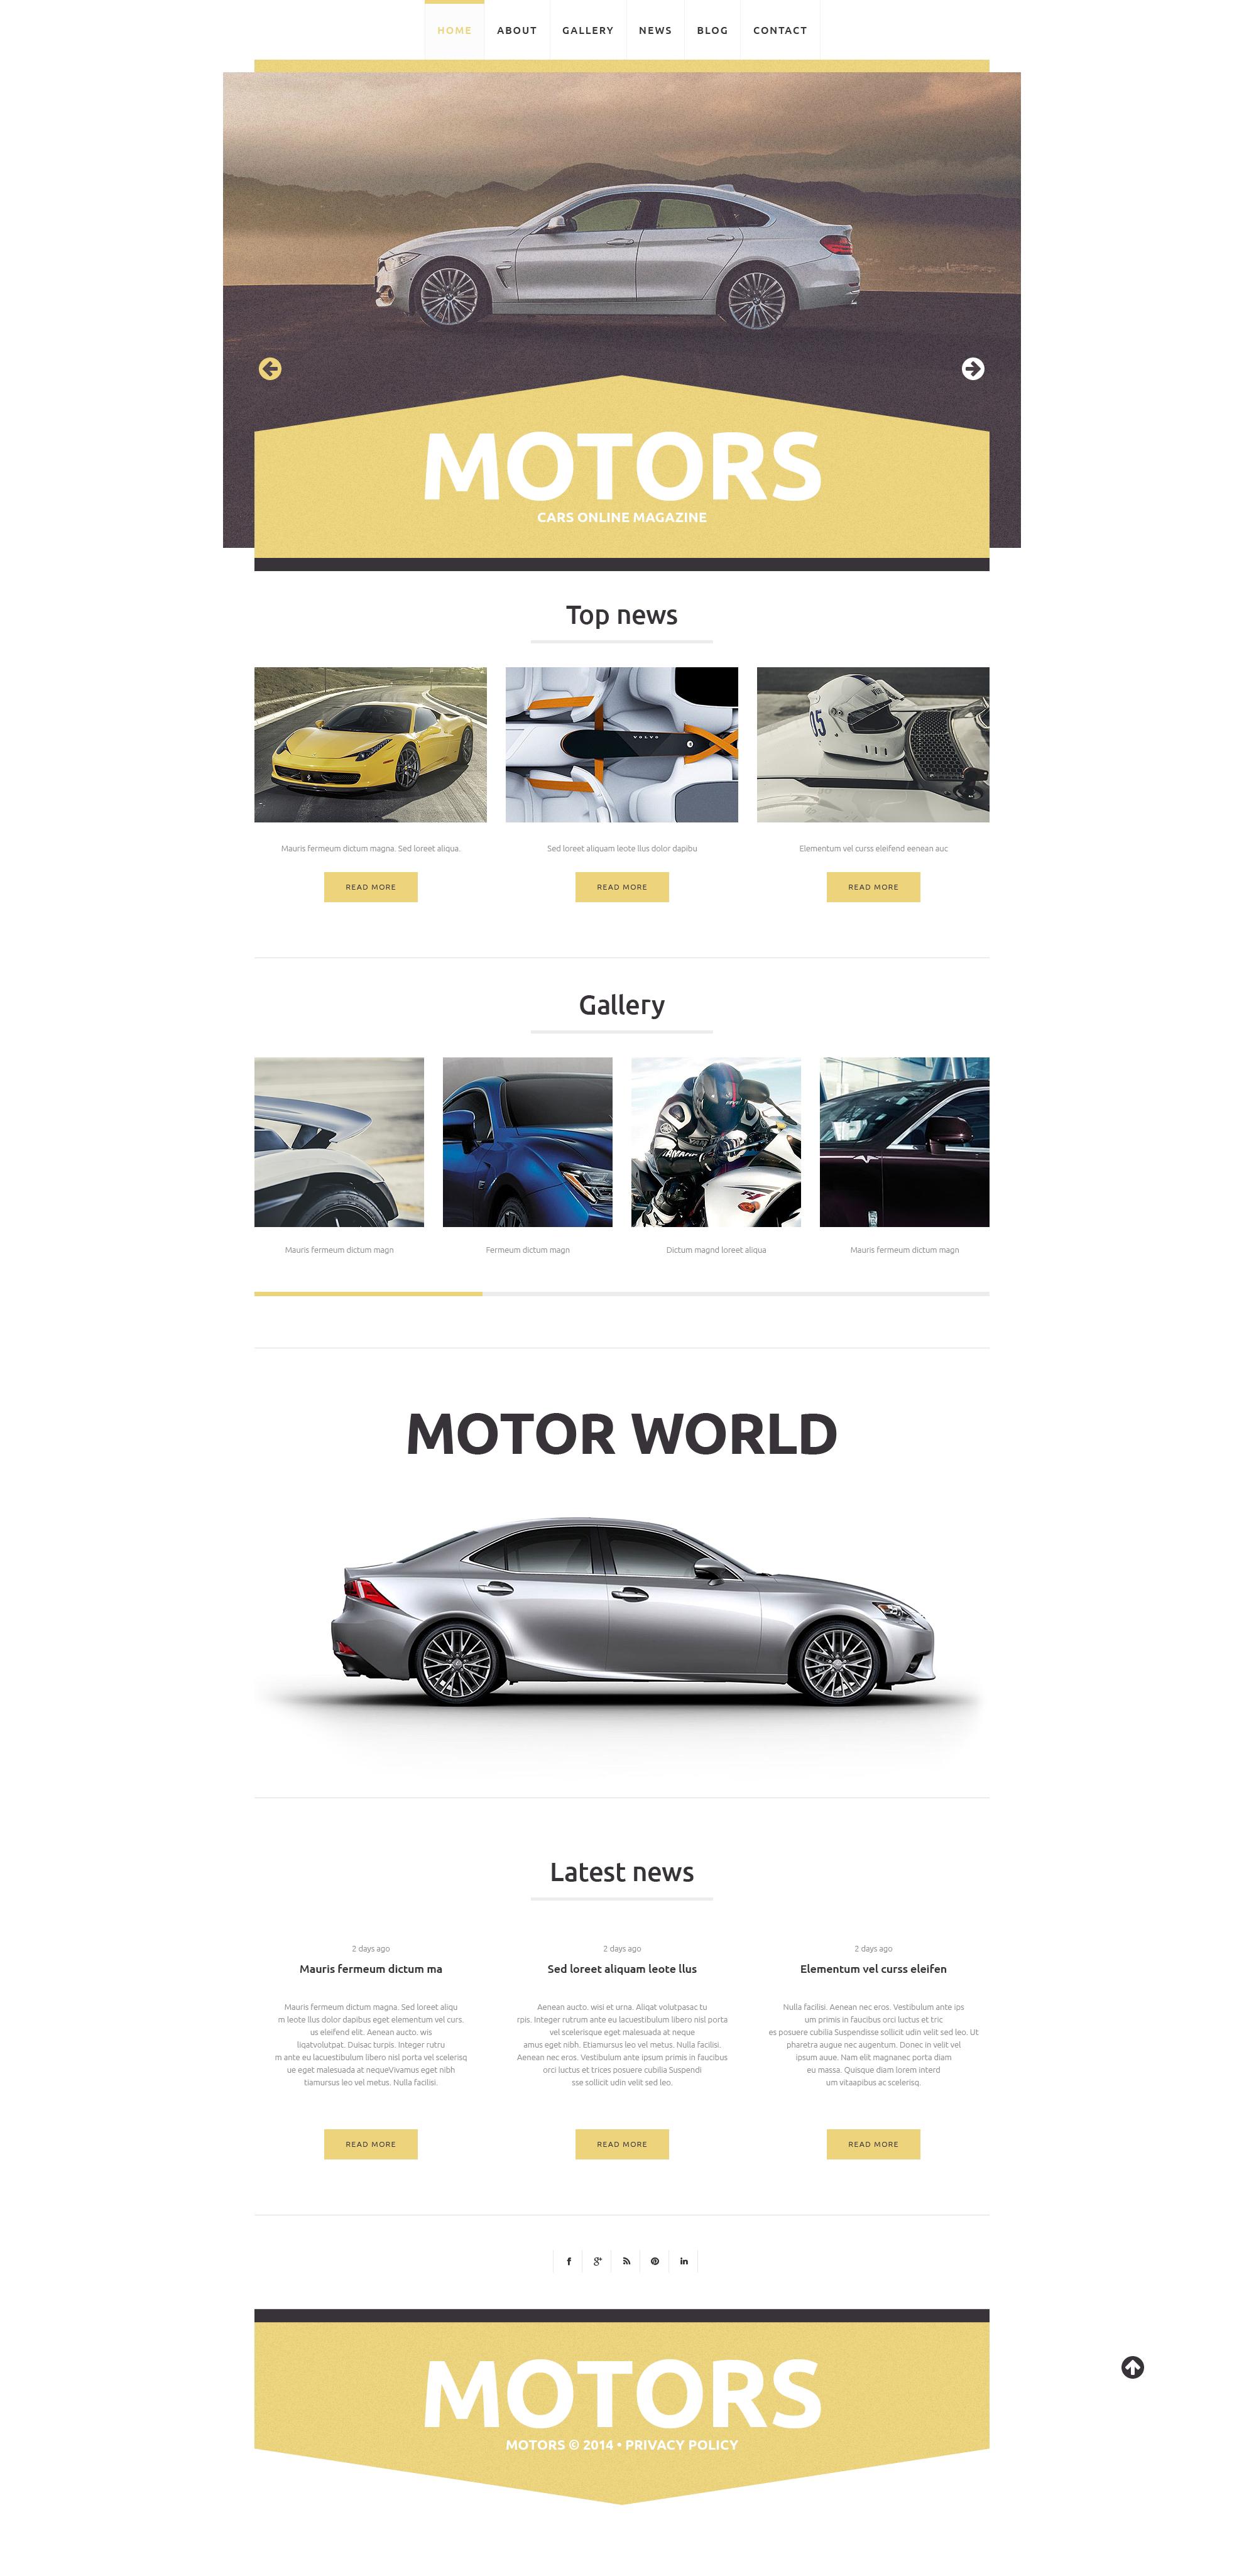 Thème WordPress adaptatif pour clubs automobiles #49009 - screenshot